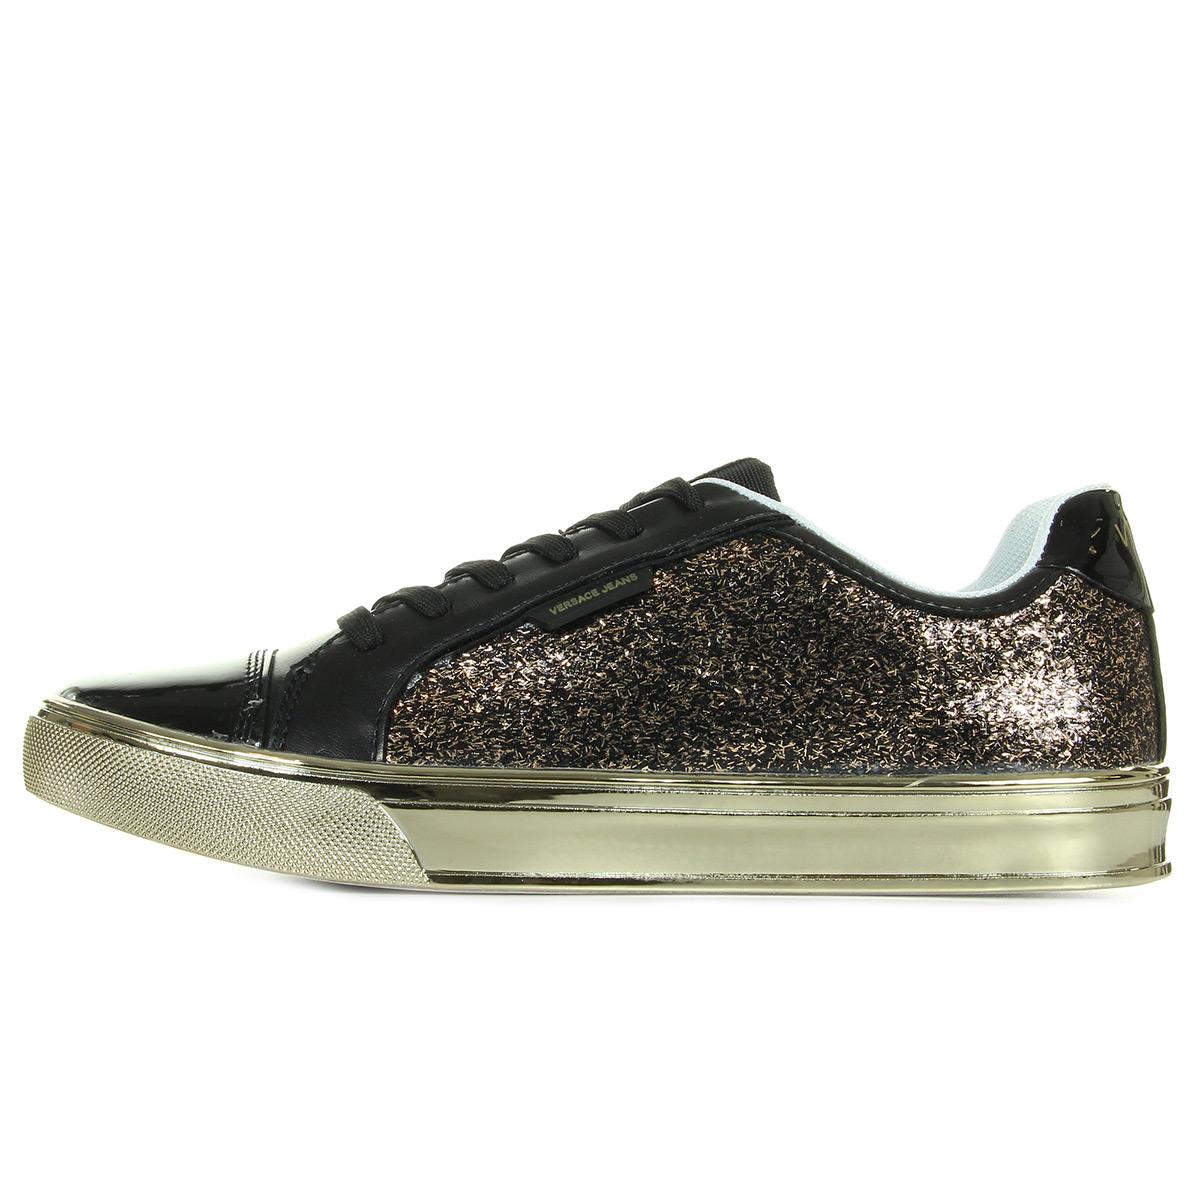 Versace Jeans Sneaker Donna DisC3 Easy Leath Glitter E0VPBSC3M27, Baskets mode femme